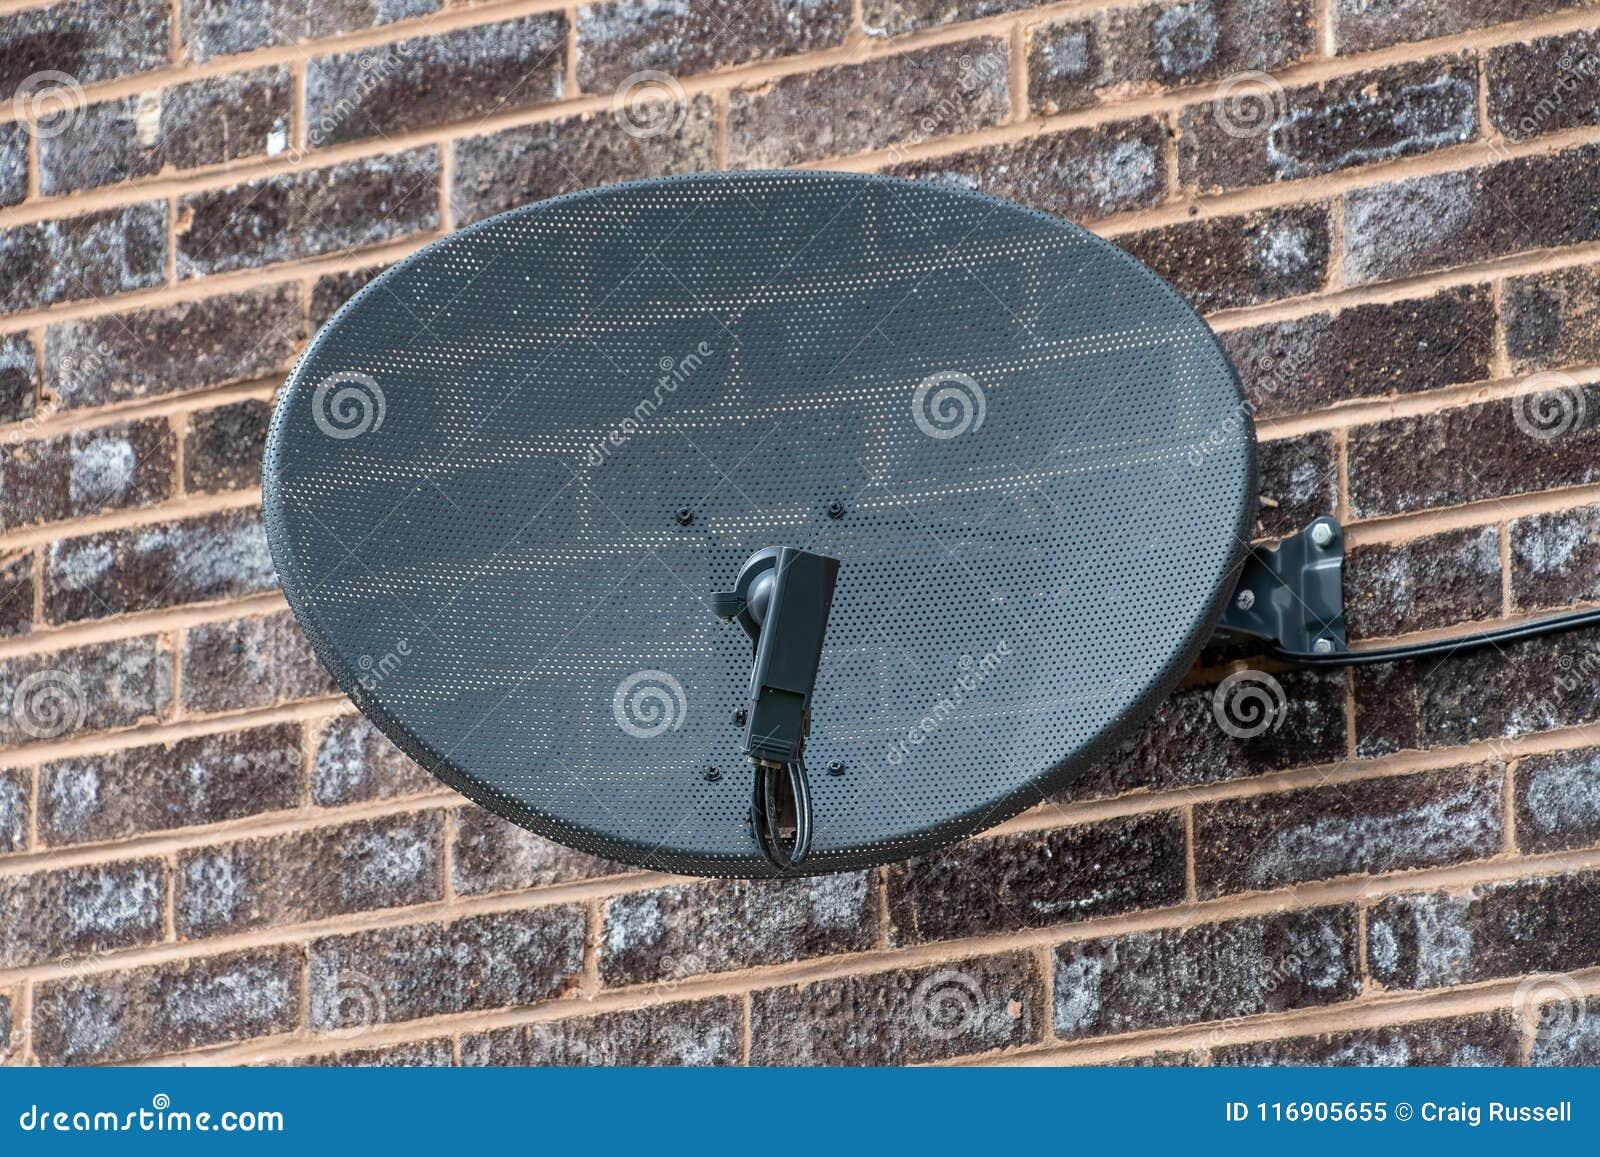 Спутниковая антенна-тарелка ТВ на кирпичной стене